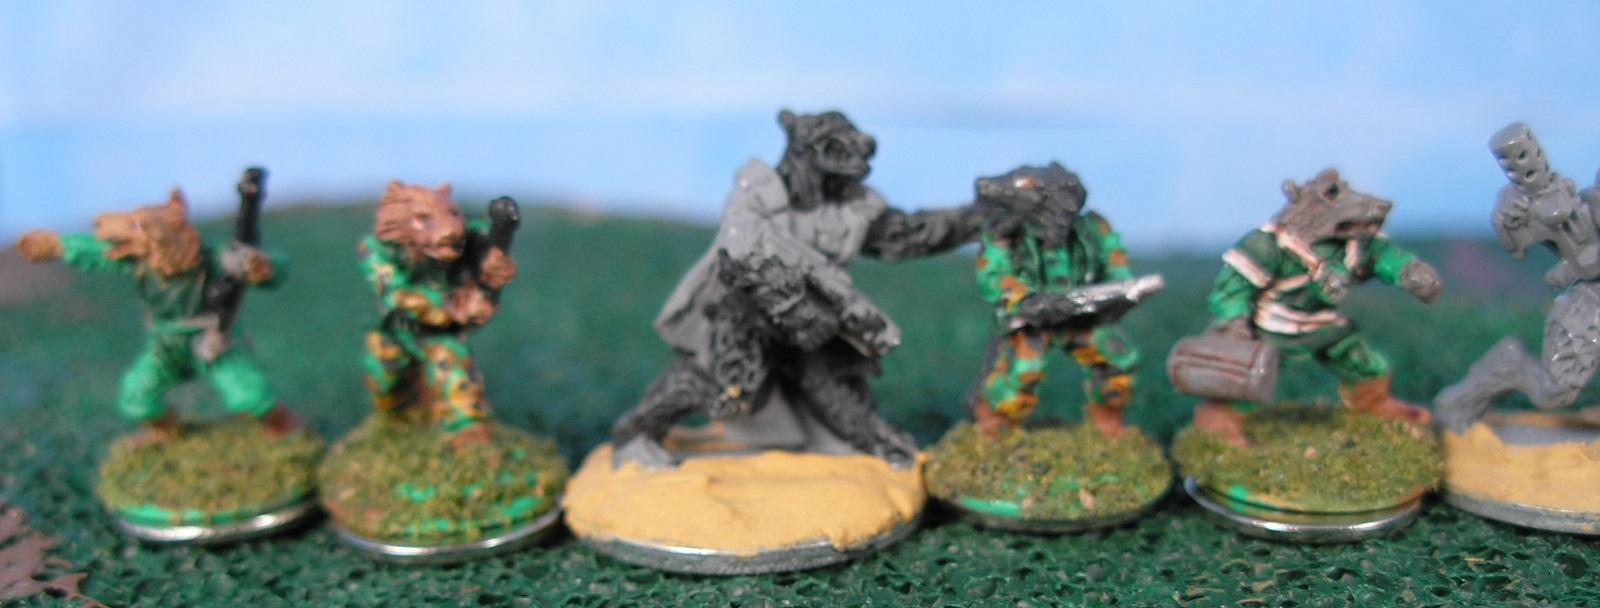 SF 15 Alternative-Armies Beotan - Rafm Warhounds 1